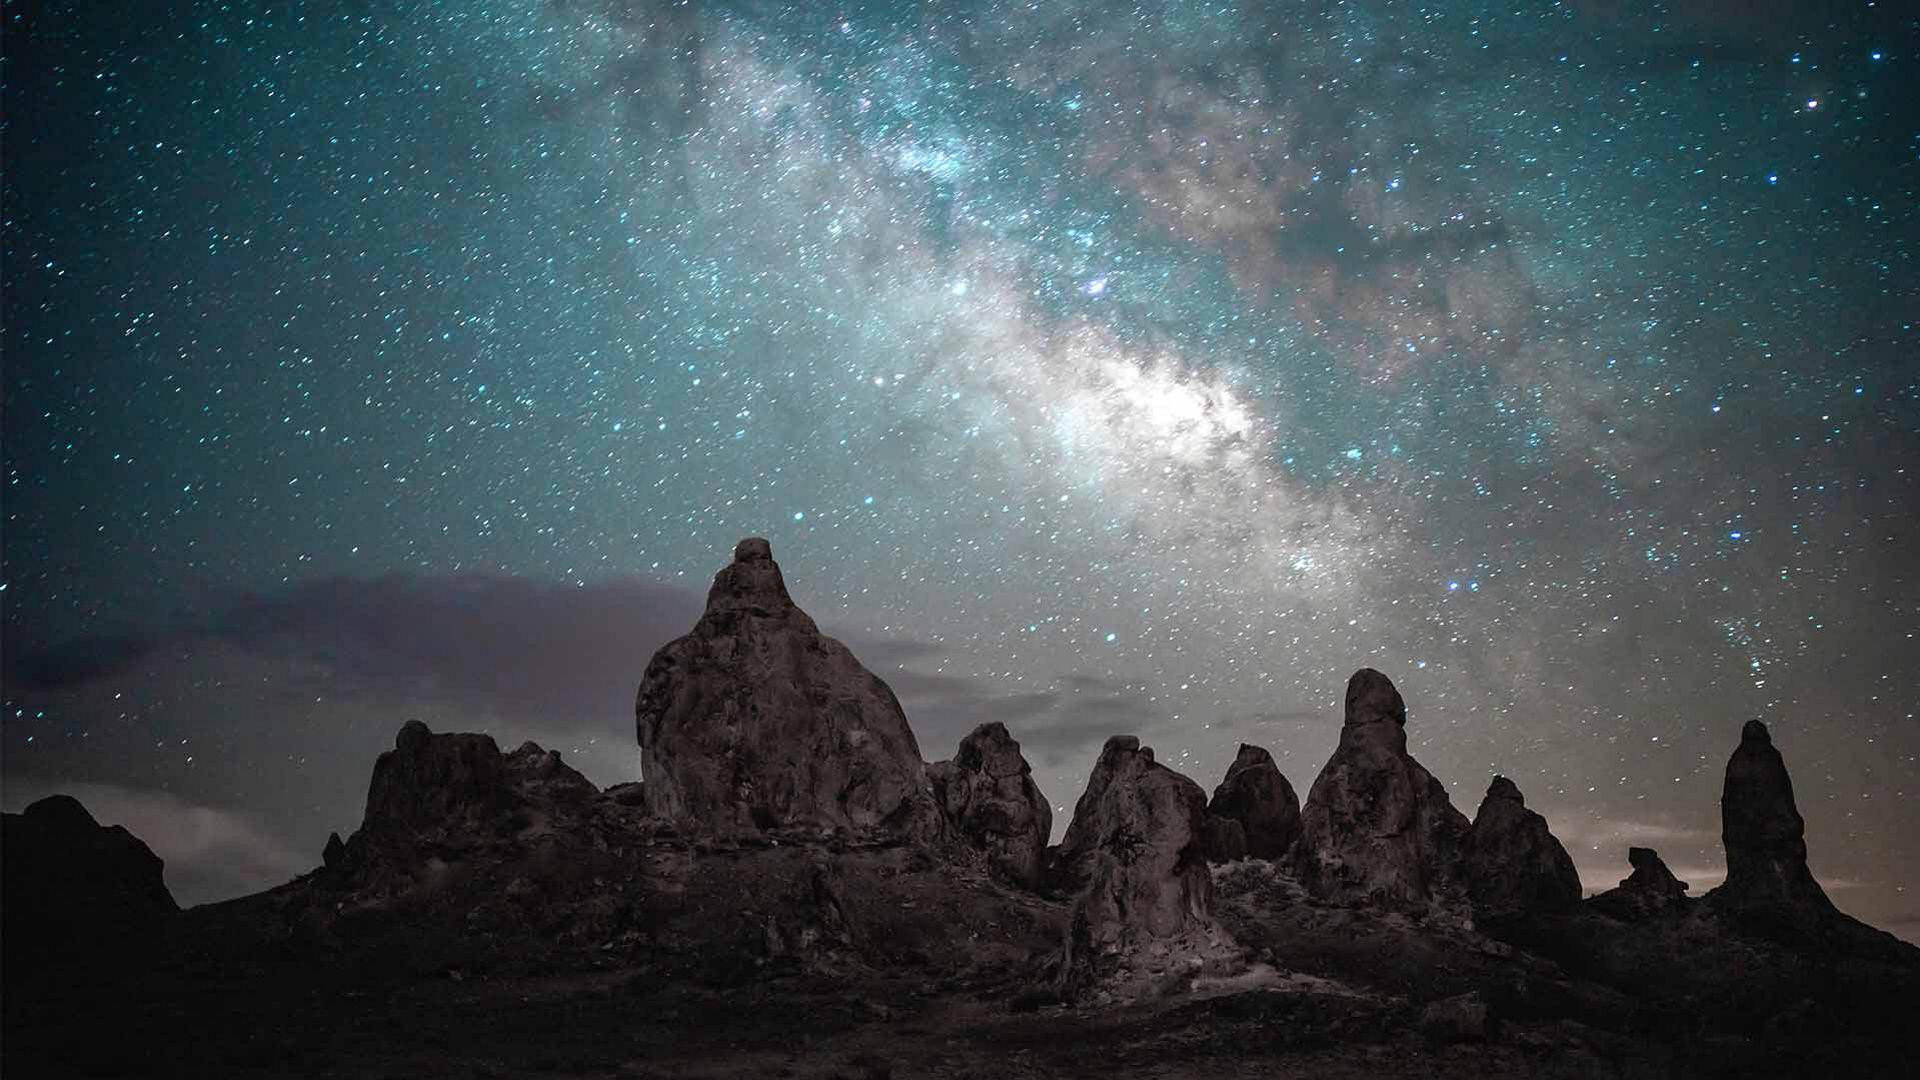 AstroGeoGuy 18.05 - 23.05.2021